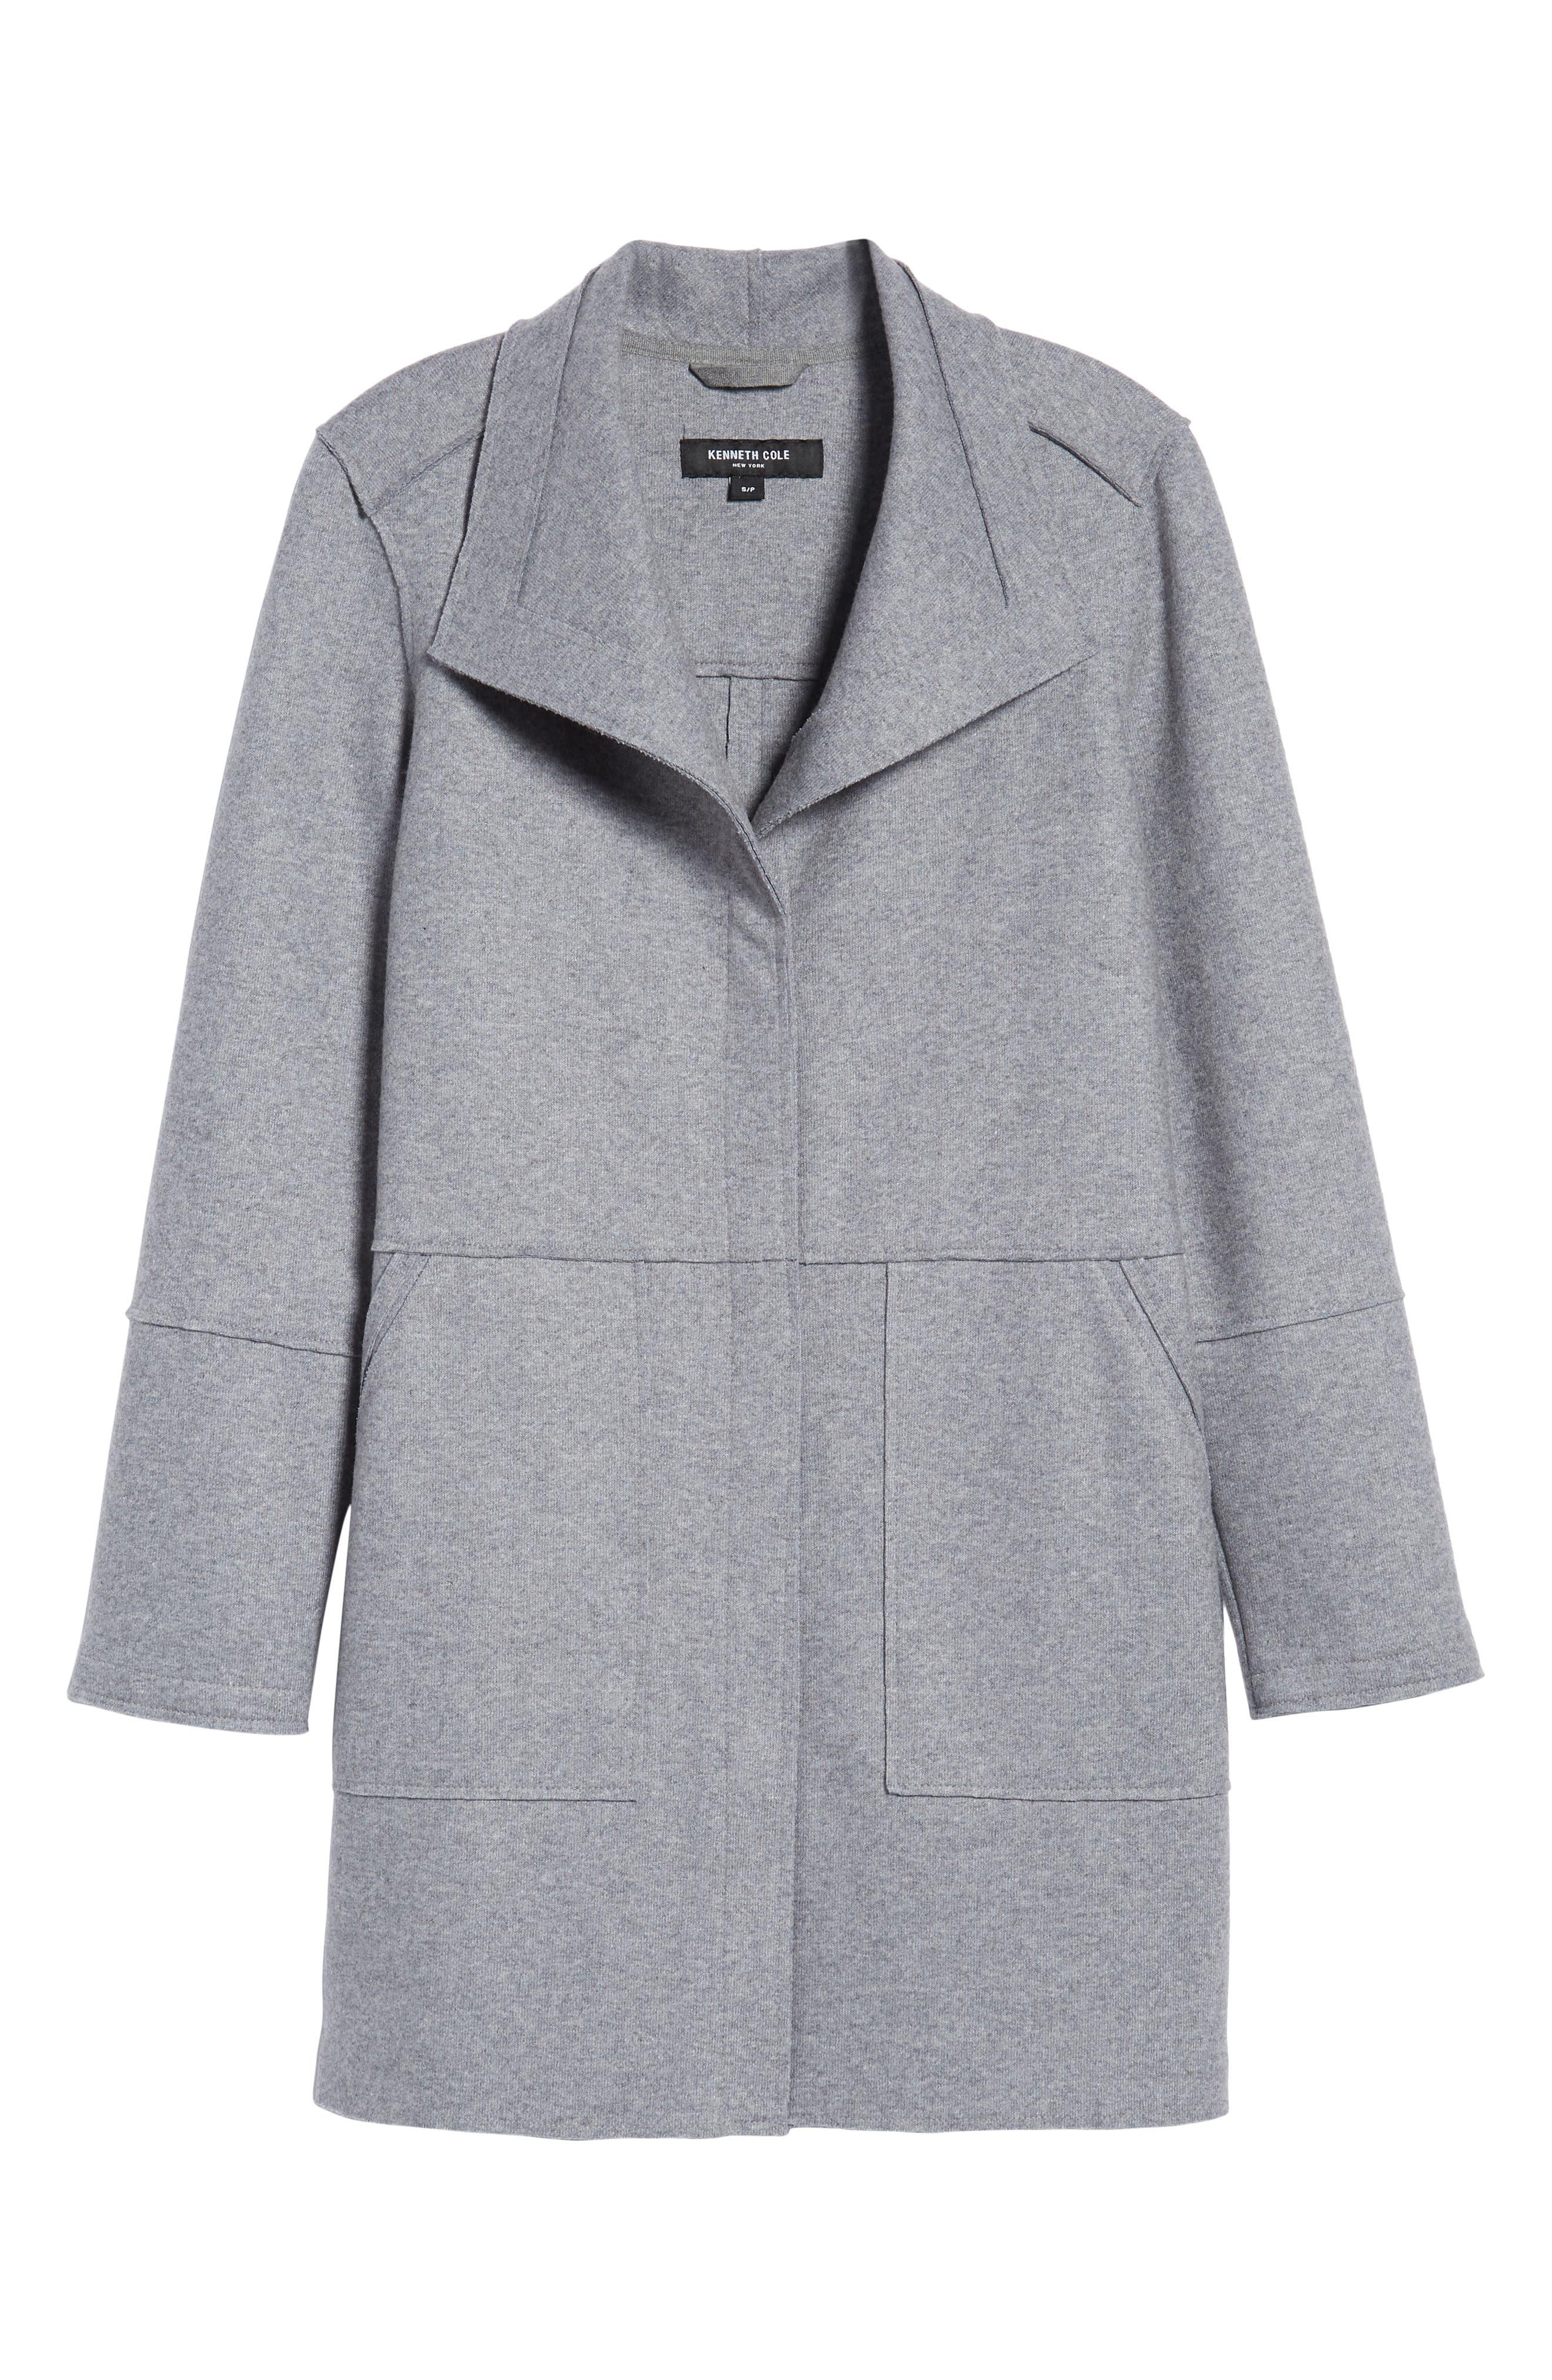 KENNETH COLE NEW YORK,                             Envelope Collar Wool Blend Knit Coat,                             Alternate thumbnail 6, color,                             033